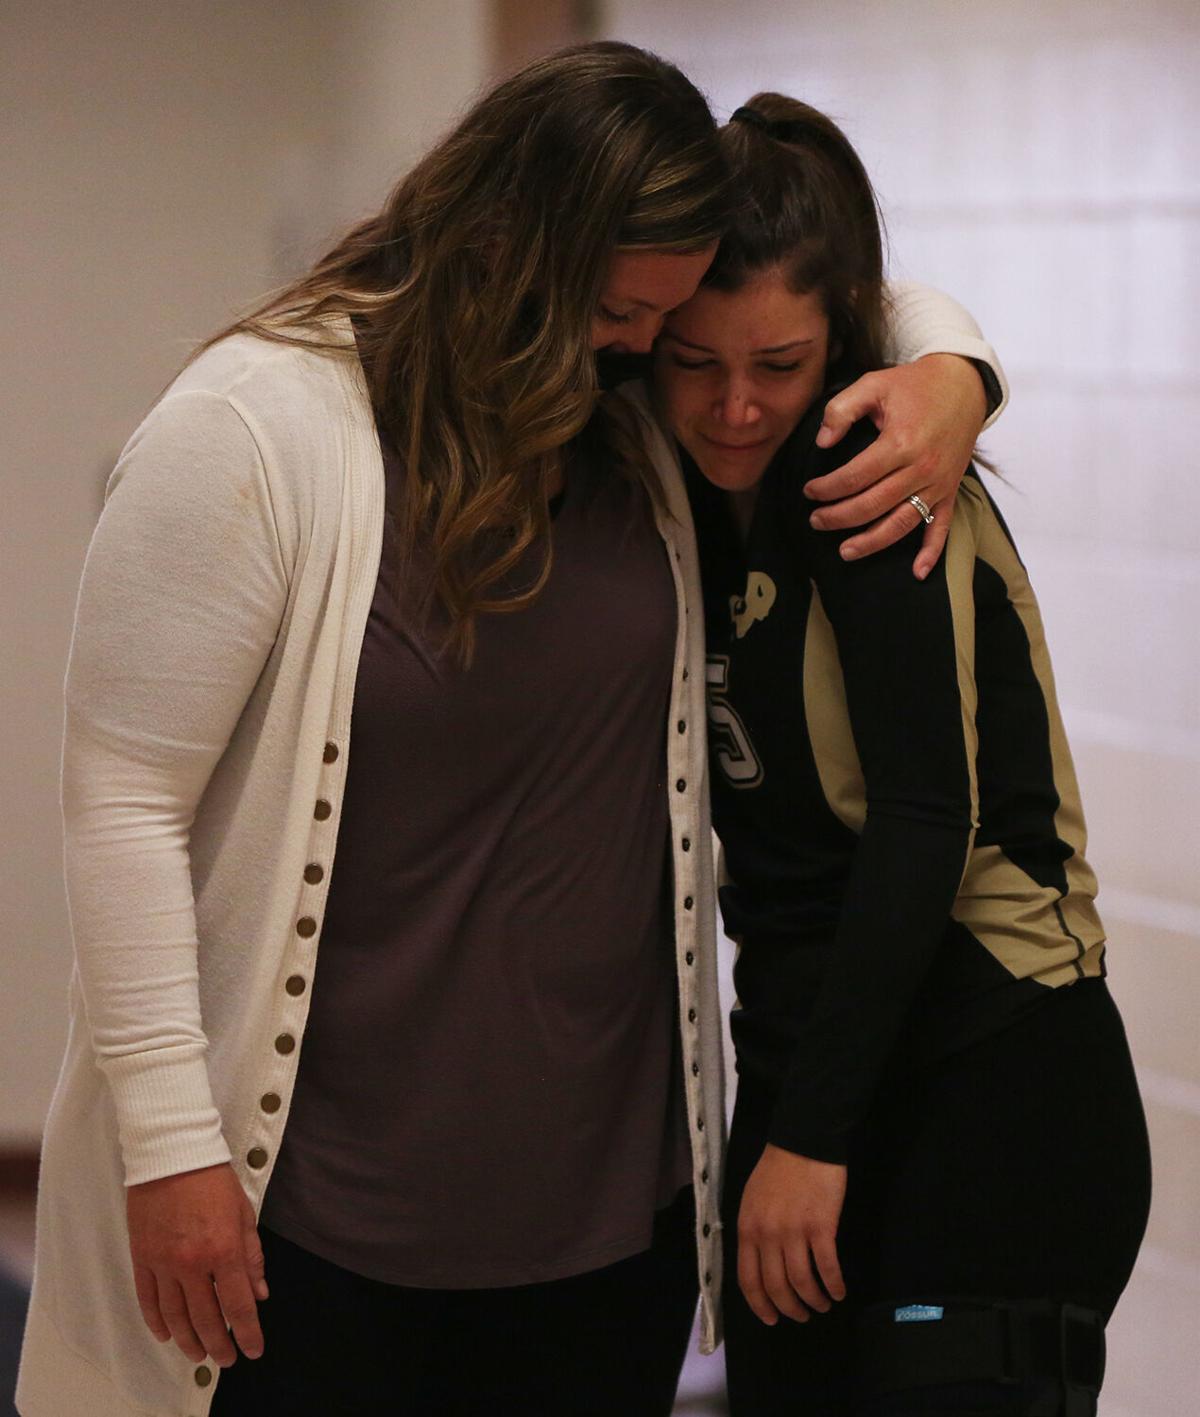 Riley Fowler hugs assistant coach Sarah Walker in the hallway